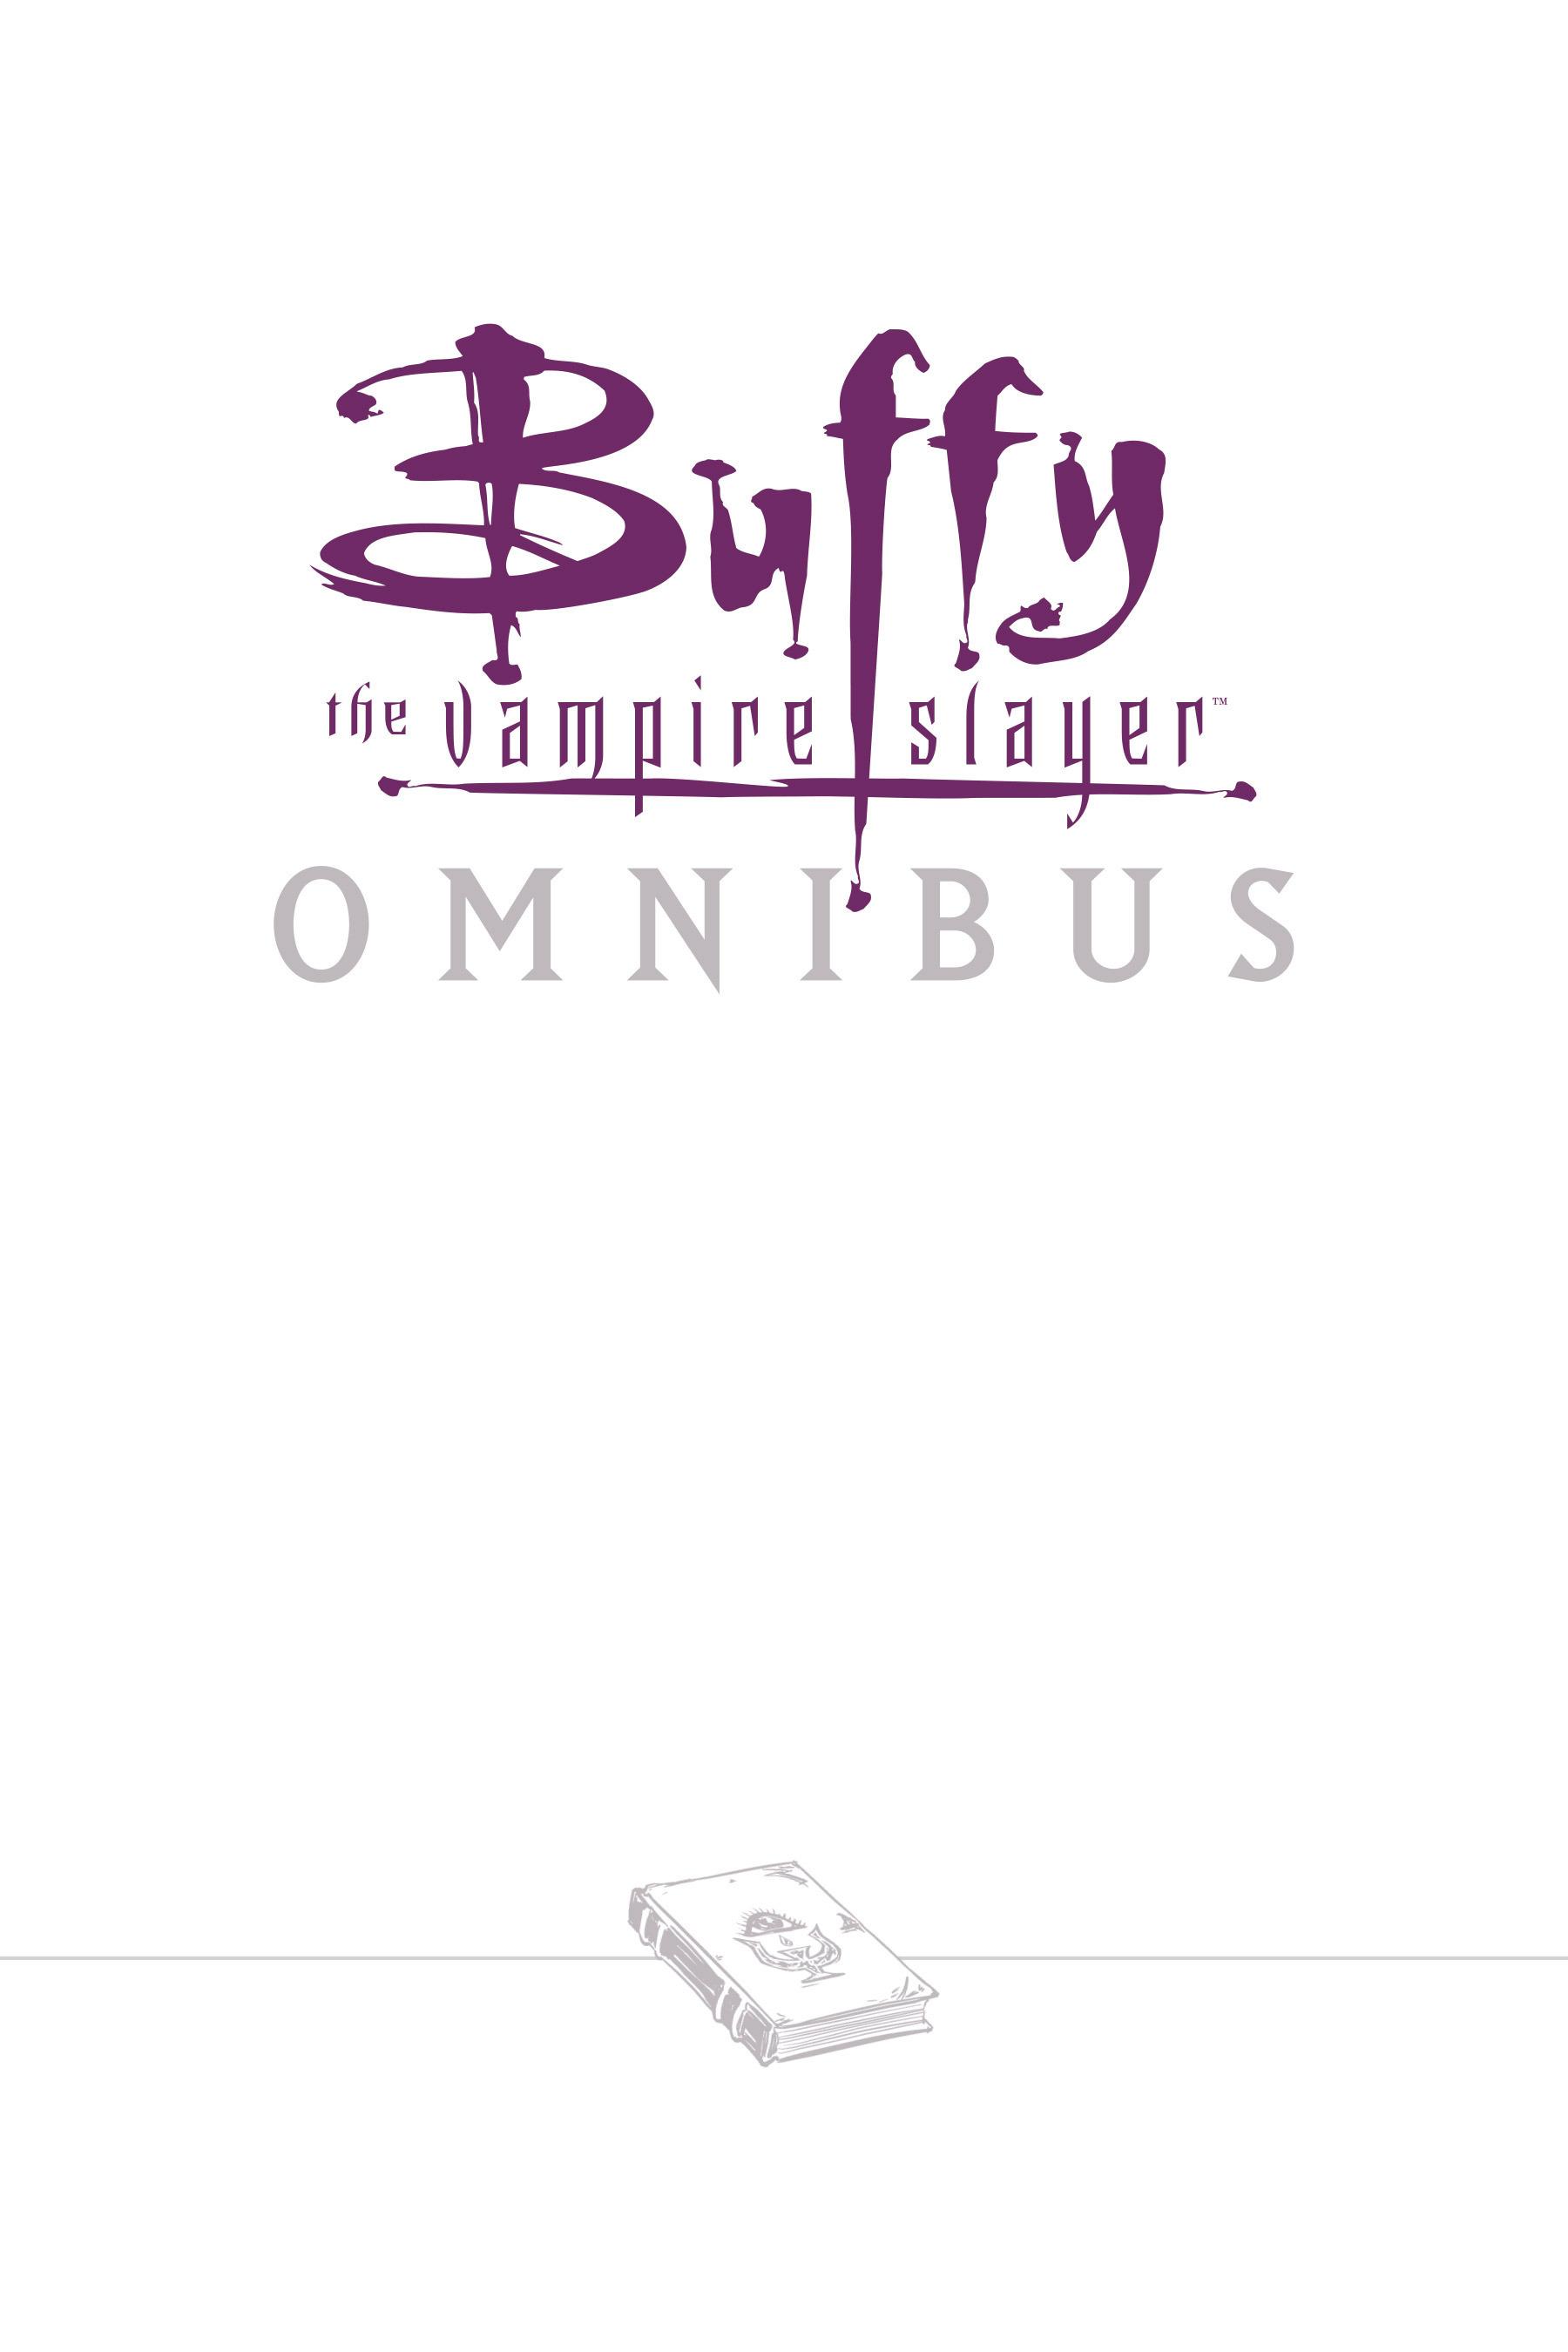 Read online Buffy the Vampire Slayer: Omnibus comic -  Issue # TPB 4 - 2